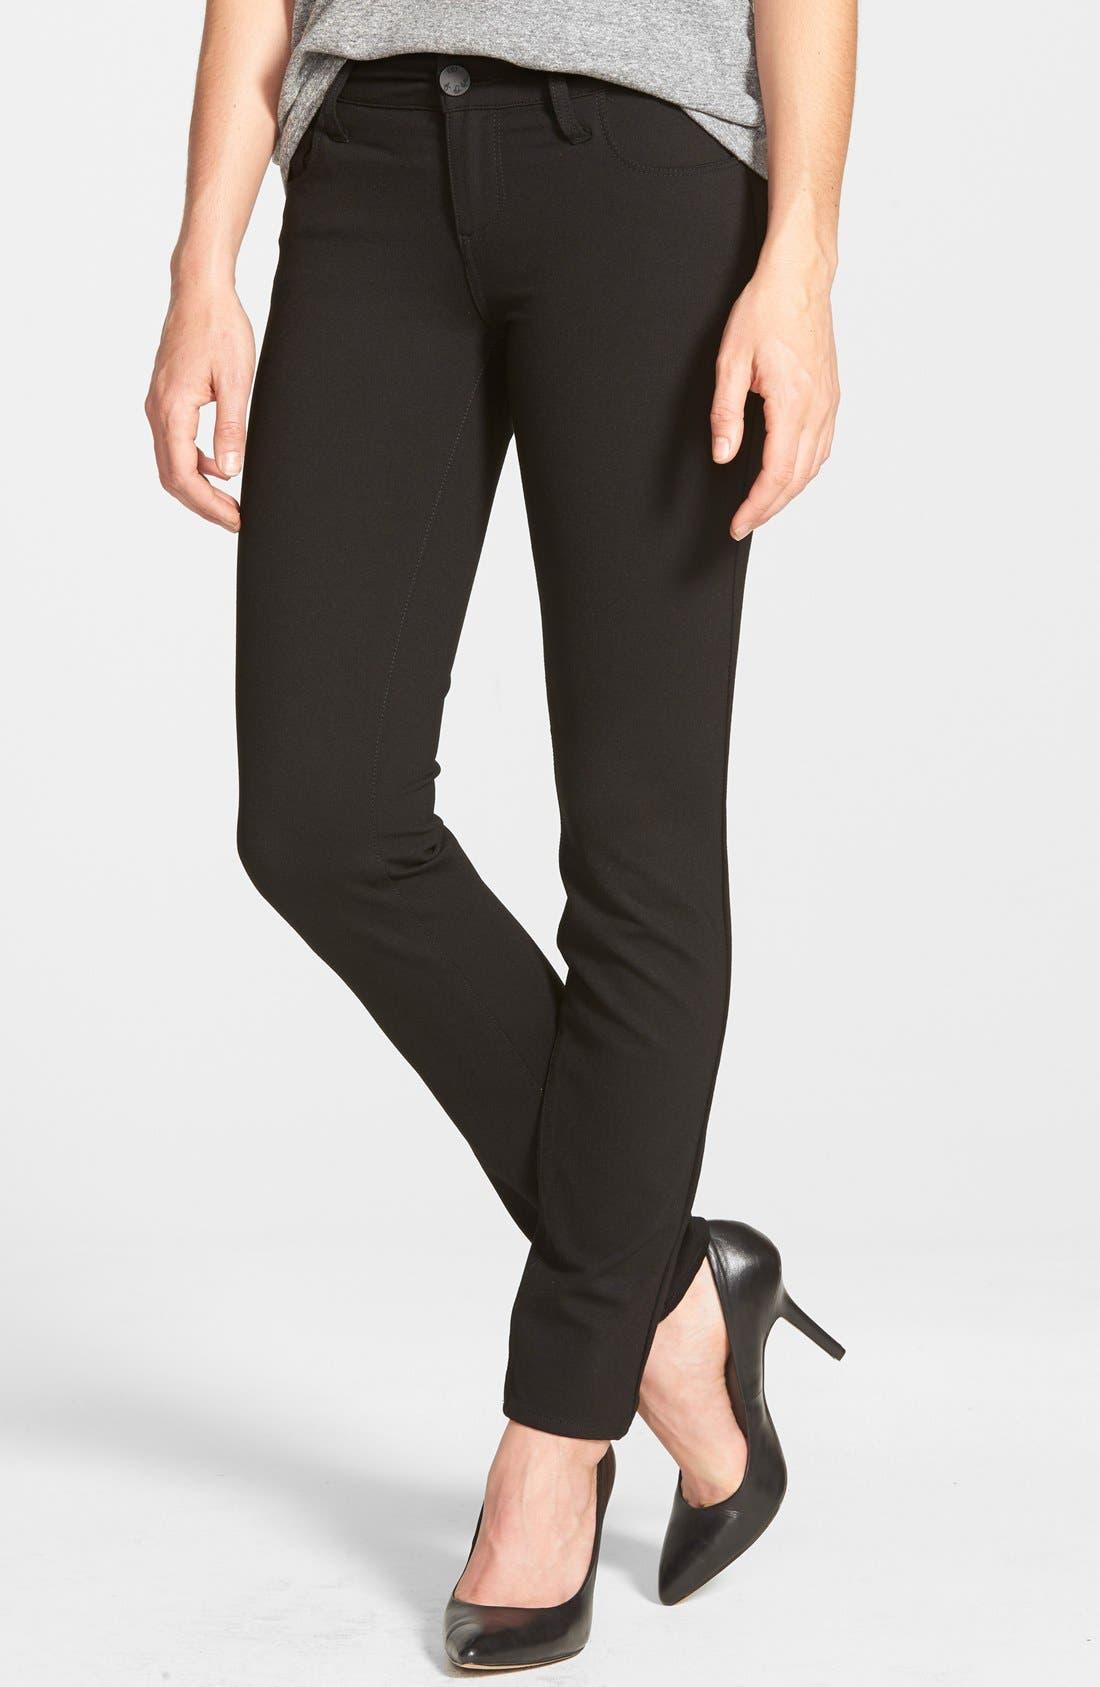 'Mia' Stretch Knit Five-Pocket Skinny Pants,                         Main,                         color, Black